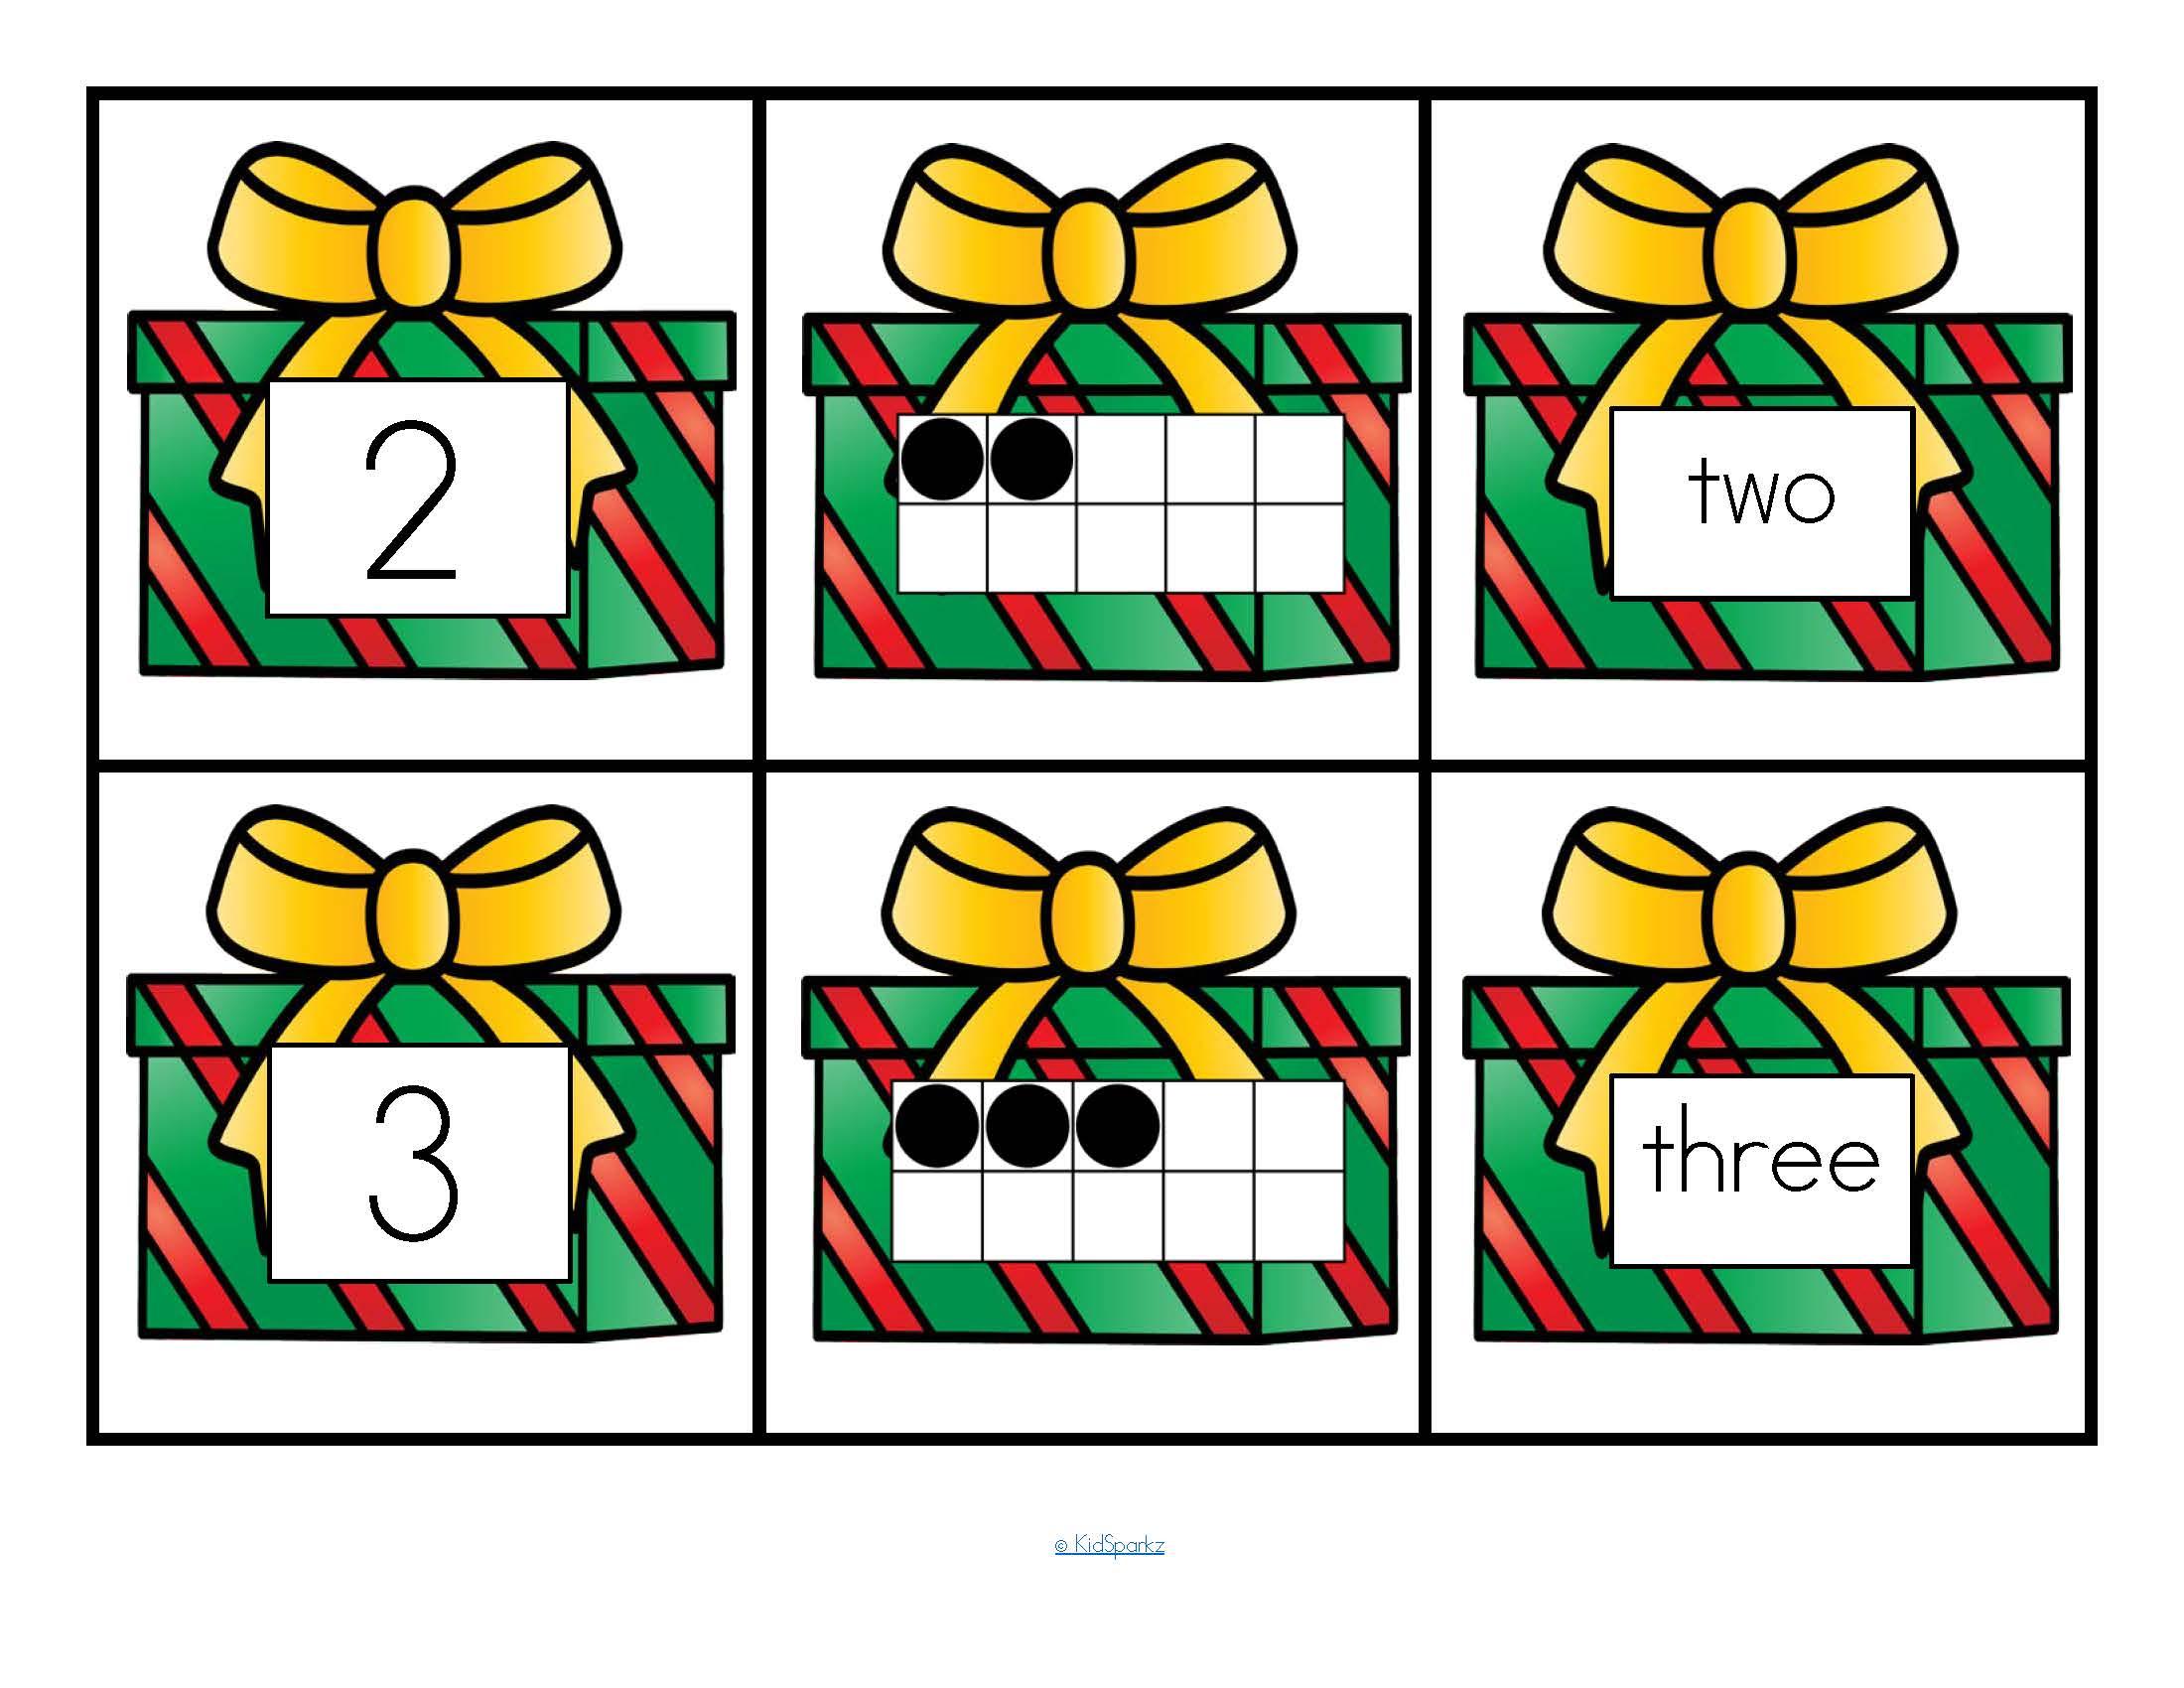 Kwanzaa Theme Activities And Printables For Preschool And Kindergarten